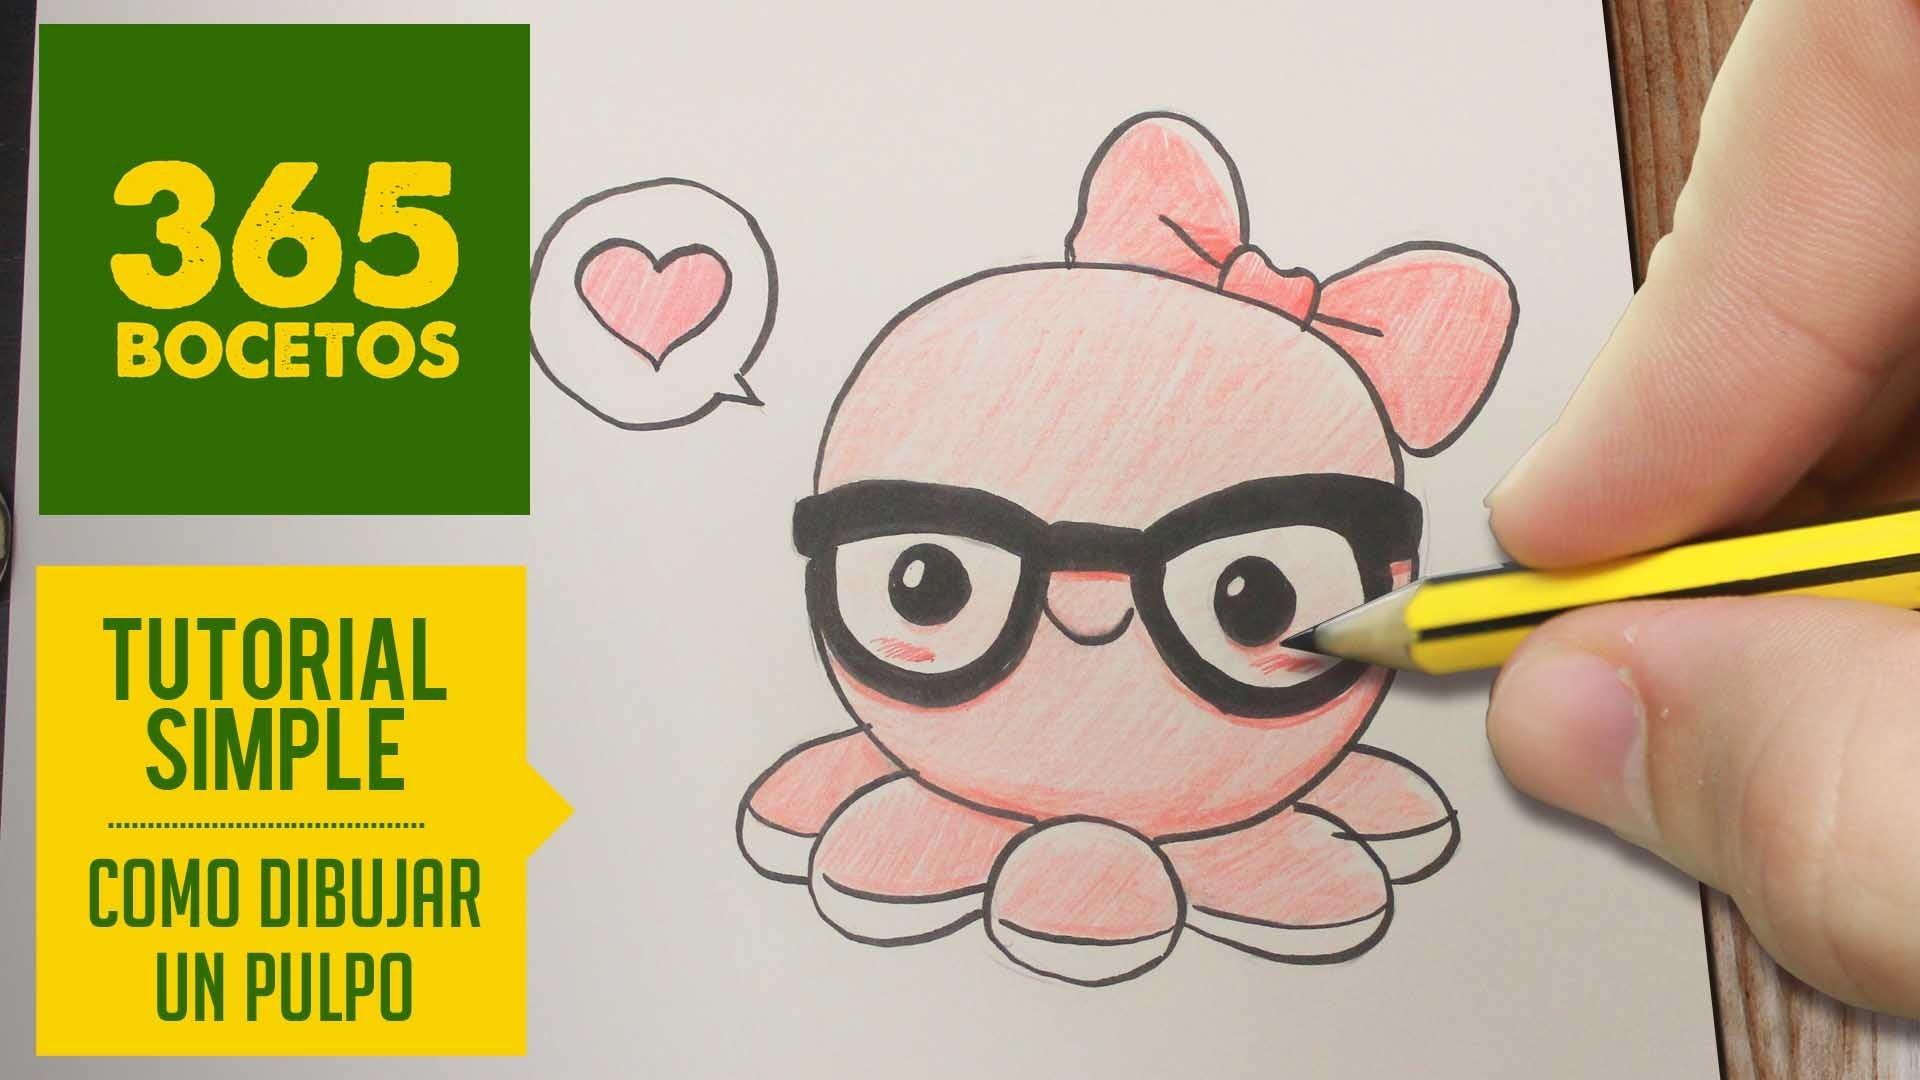 COMO DIBUJAR UN PULPO KAWAII PASO A PASO - Dibujos kawaii faciles - How to draw a octopus